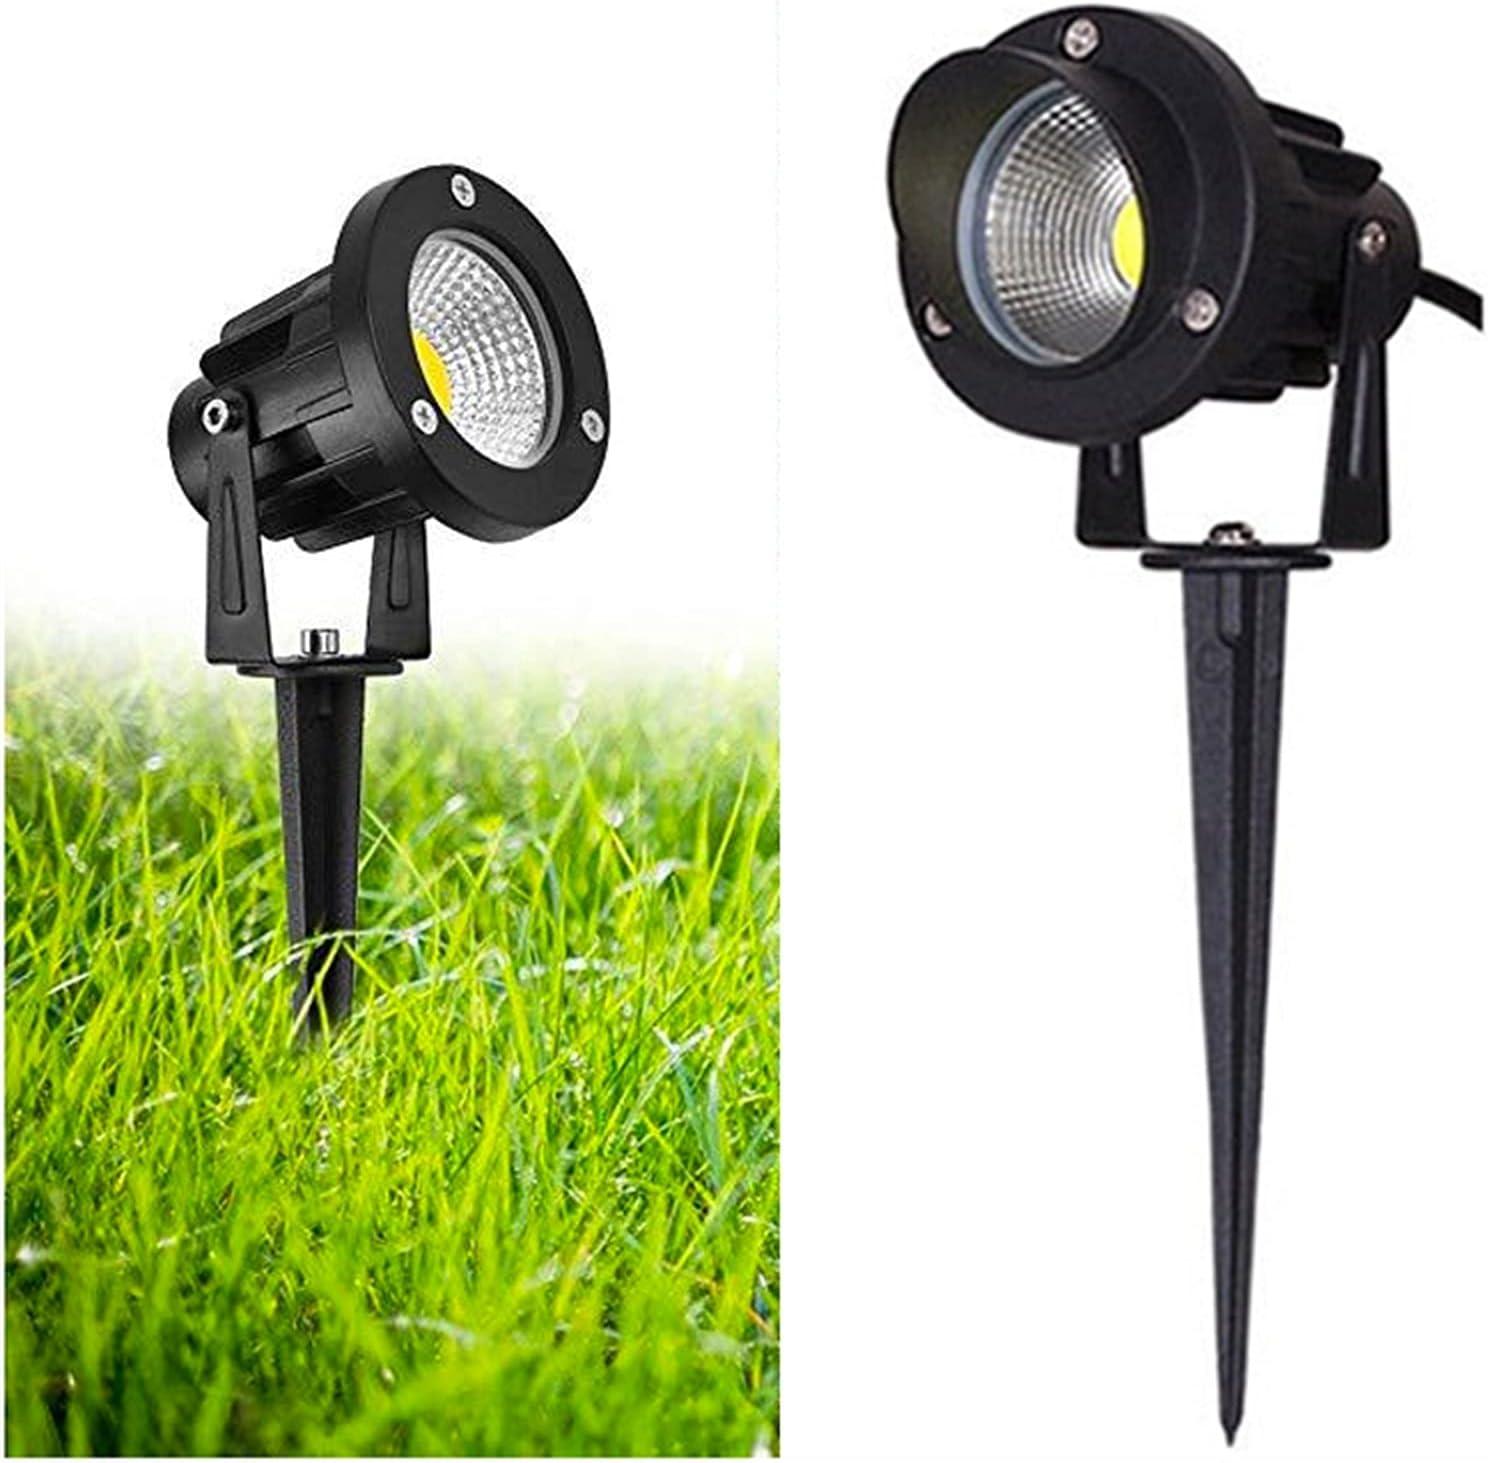 ZHM LED Outdoor Spotlight COB Garden 220V Lawn OFFicial store 110V Light Lamp Ranking TOP6 1